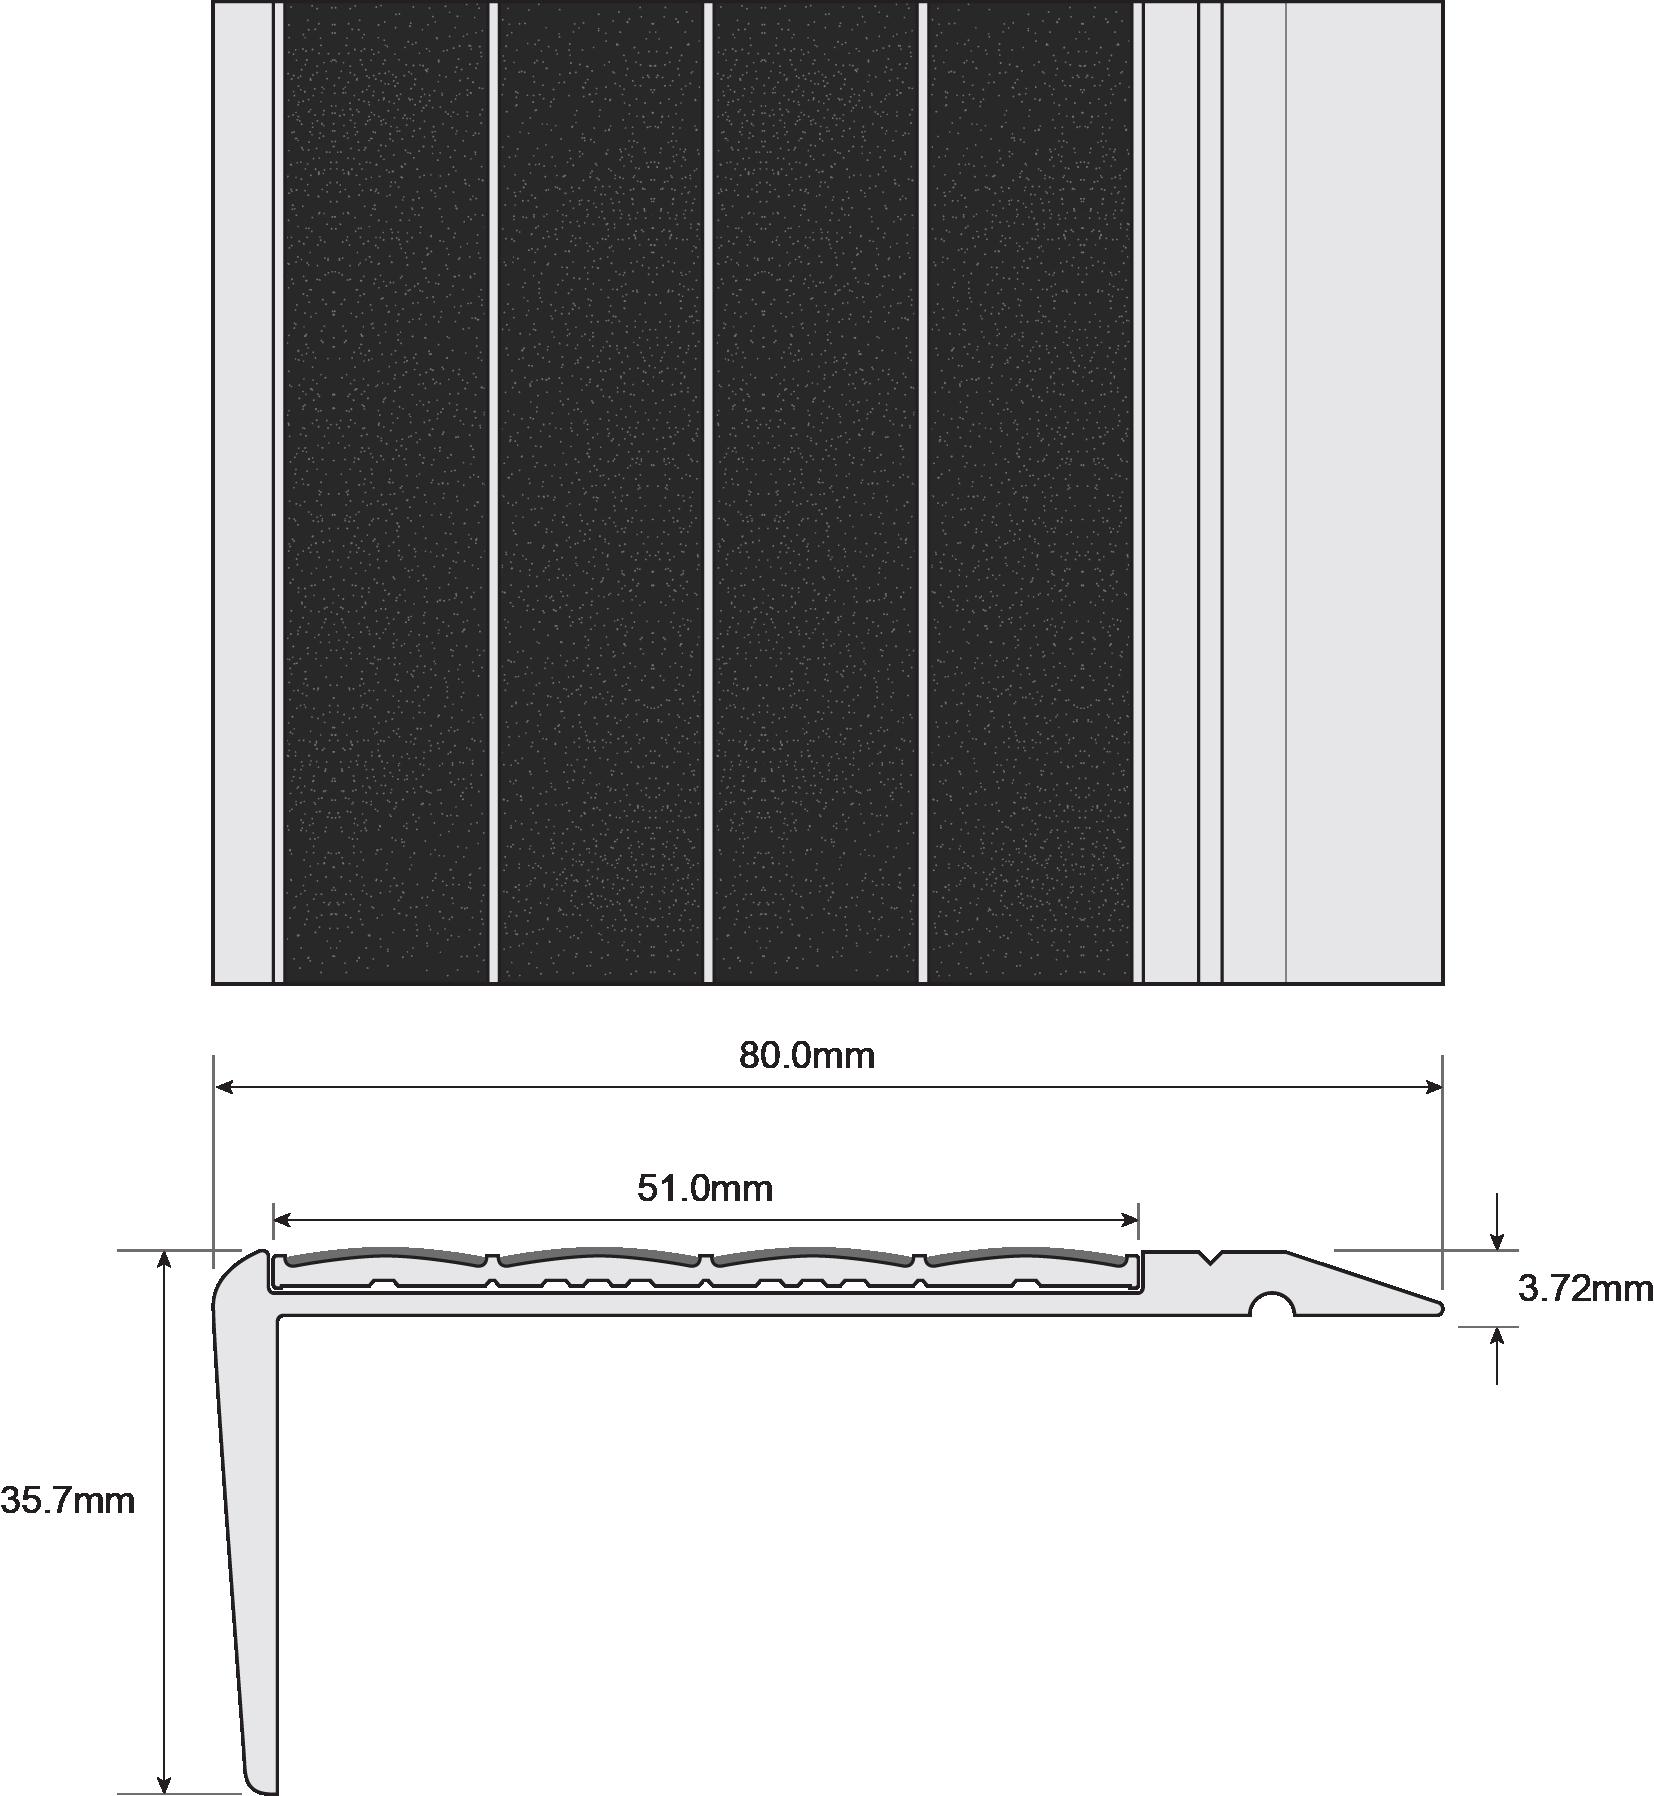 ESP Stair Nosing 35.7x80mm F430170 BLACK Techincal Drawing